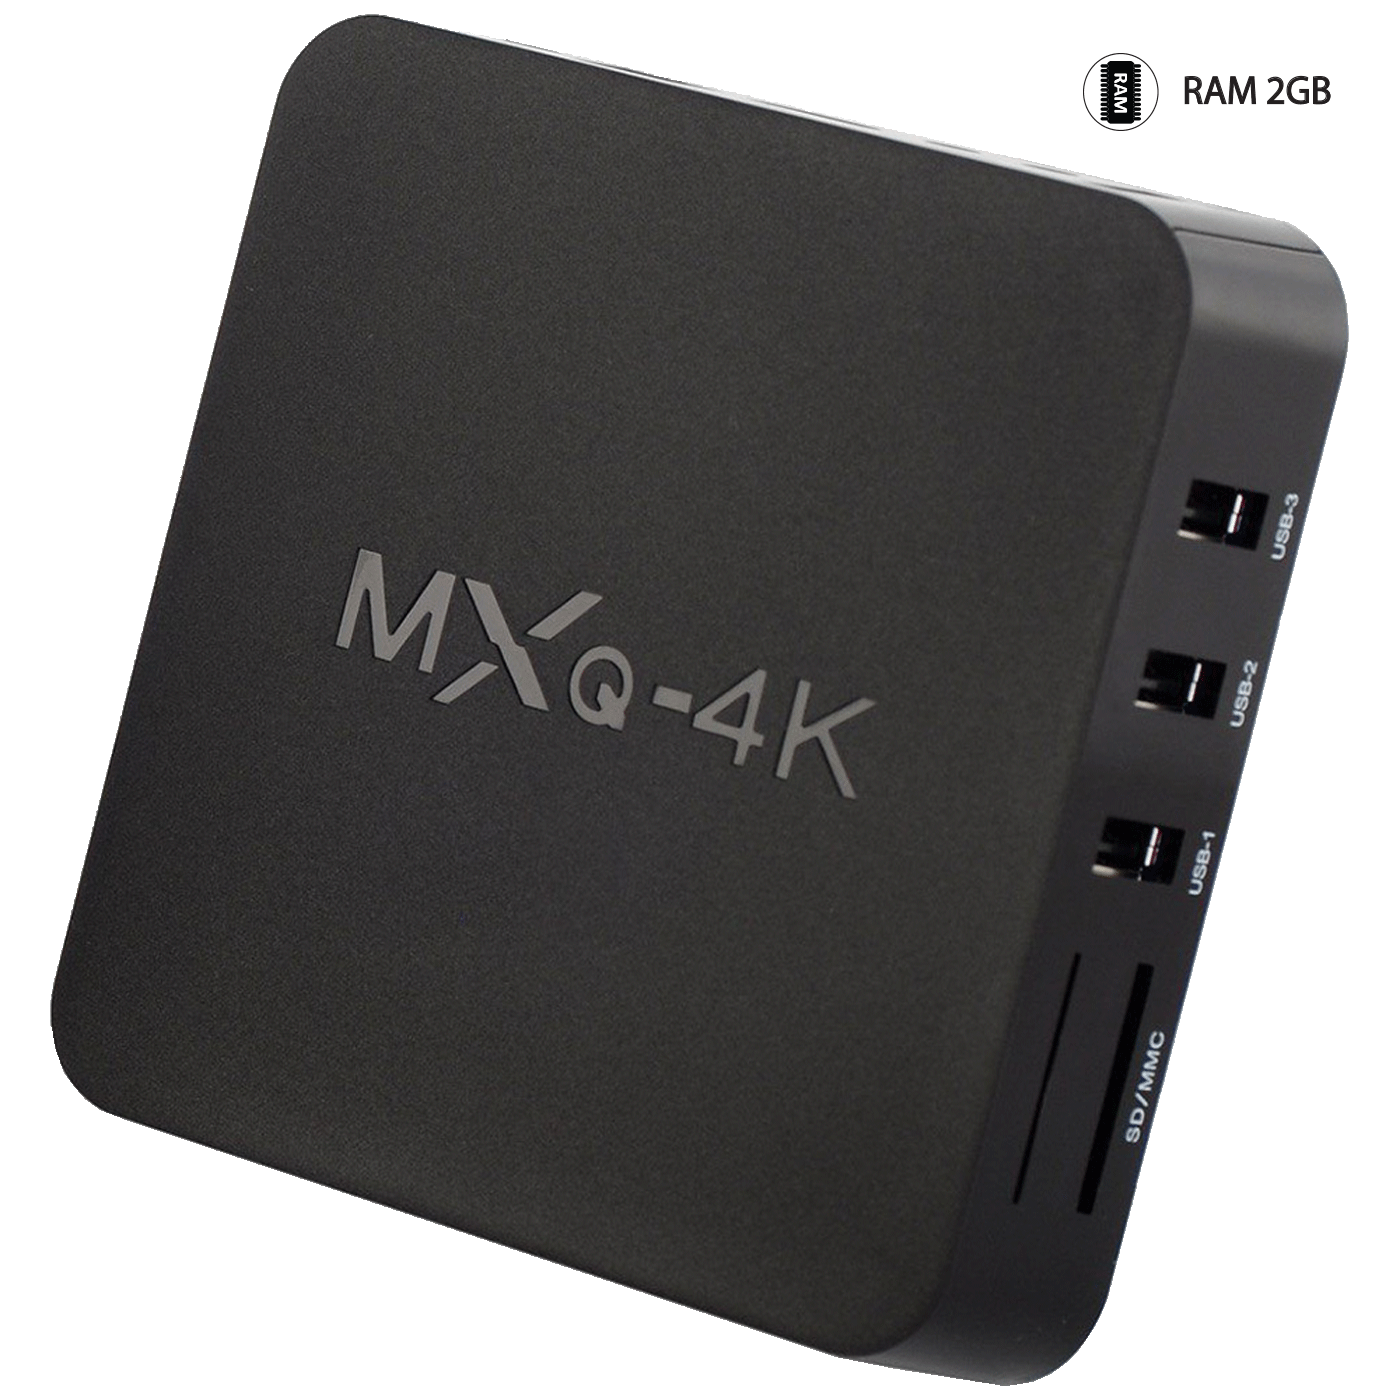 Falcom - MXQ-4K 2GB